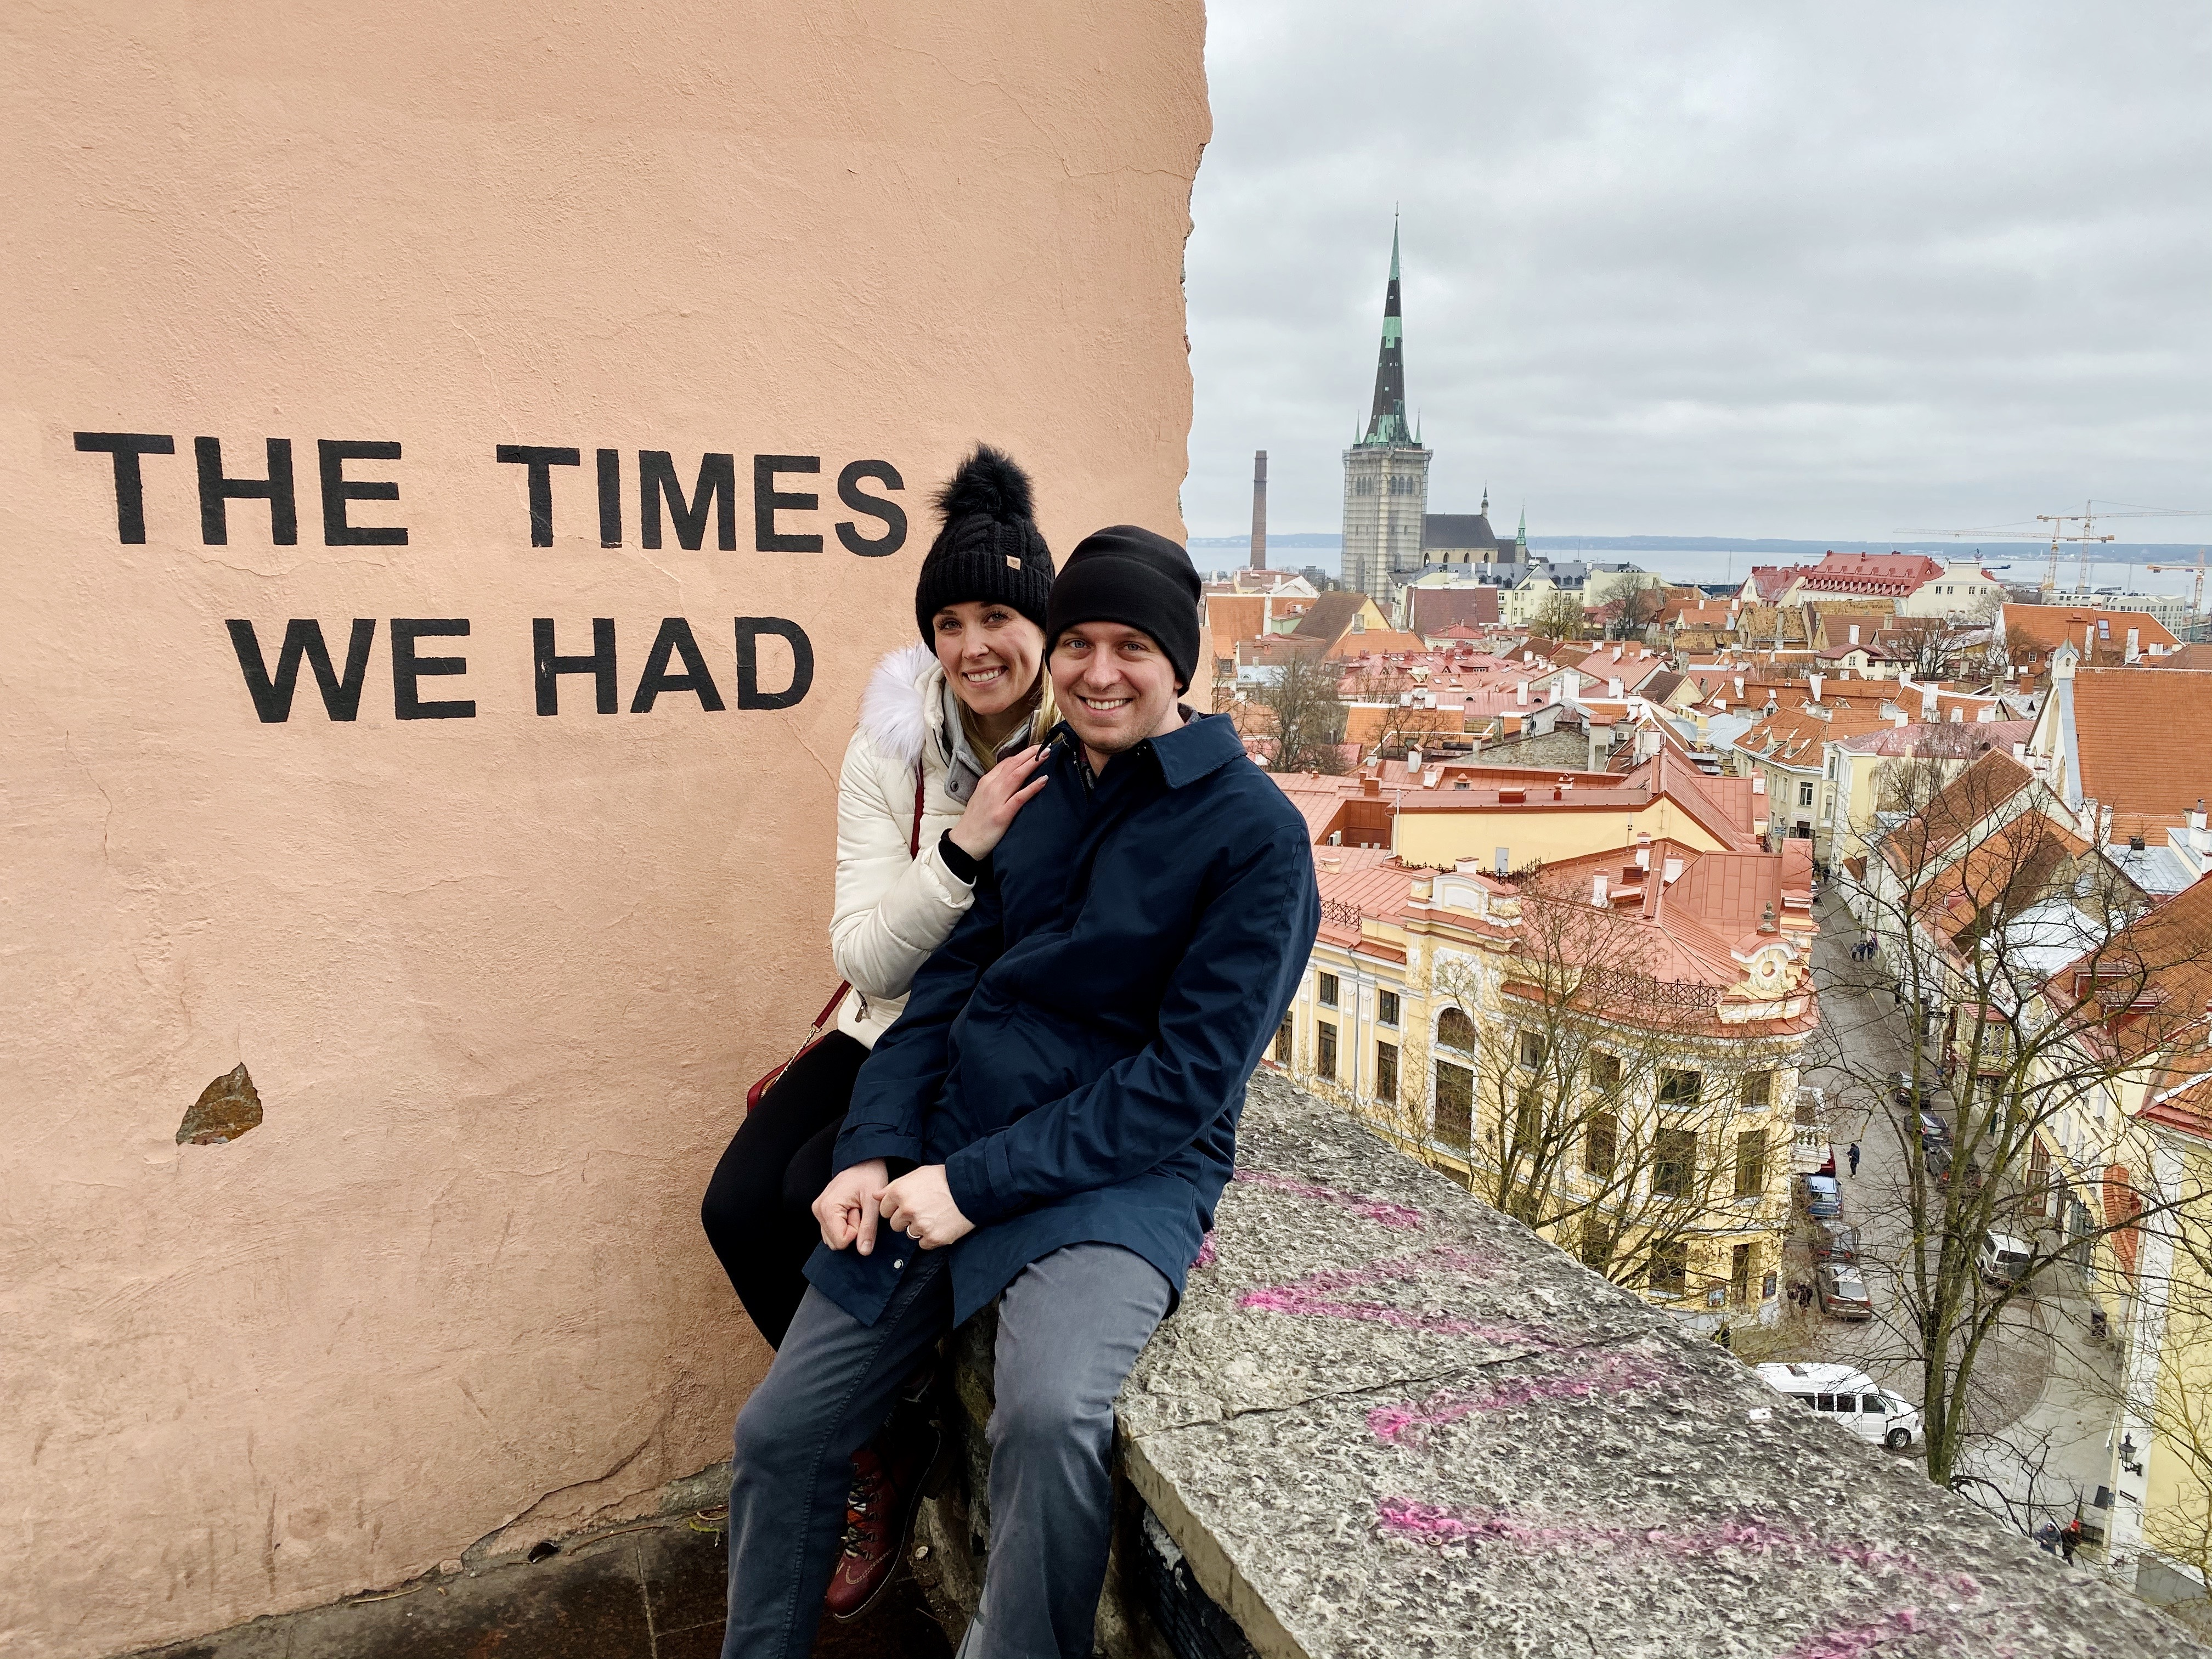 Erinn and Ben at THE TIMES WE HAD wall in Tallinn, Estonia.